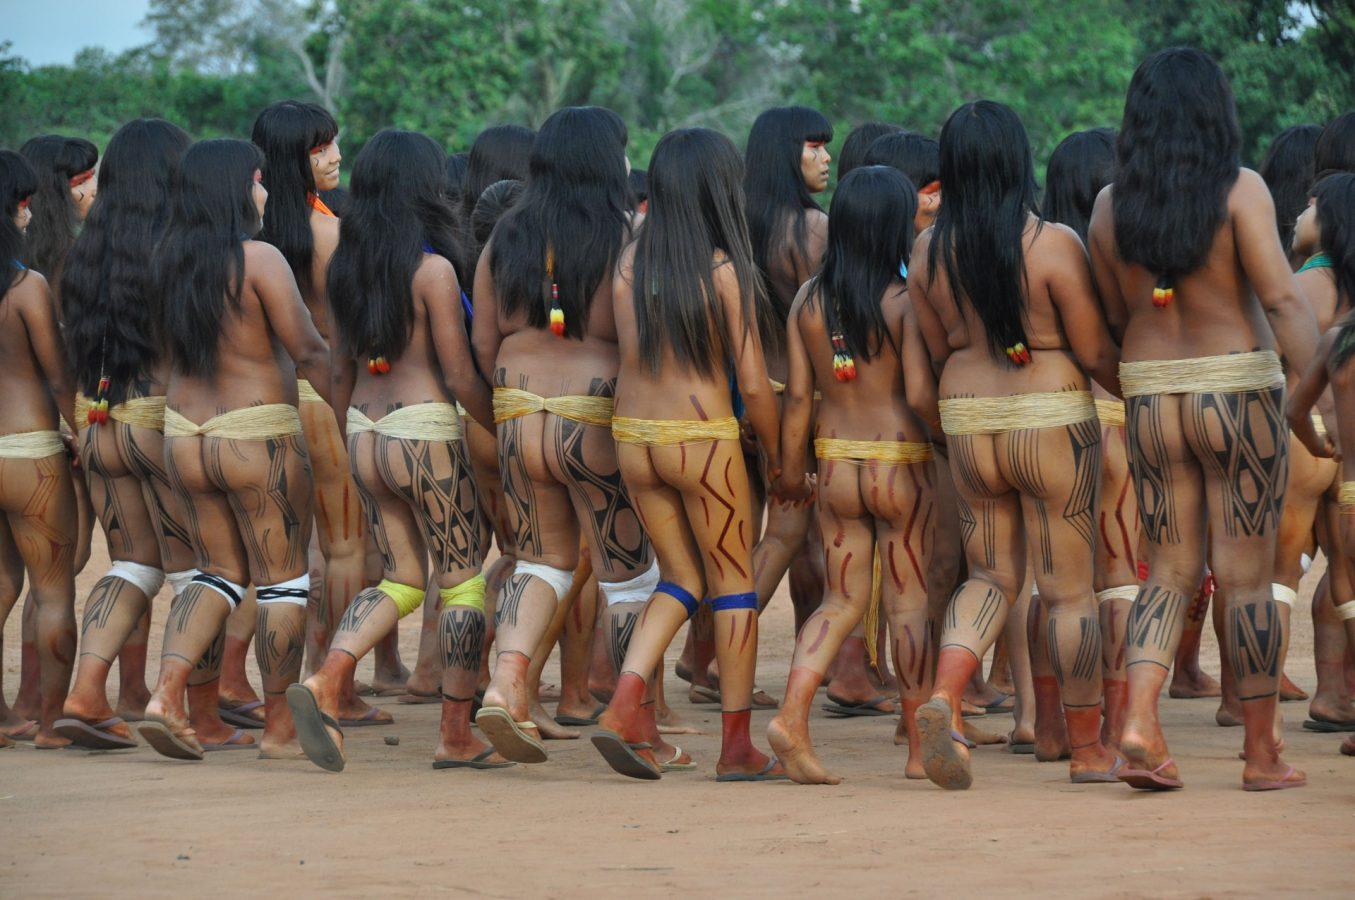 Голое племя индейцев видео — pic 2